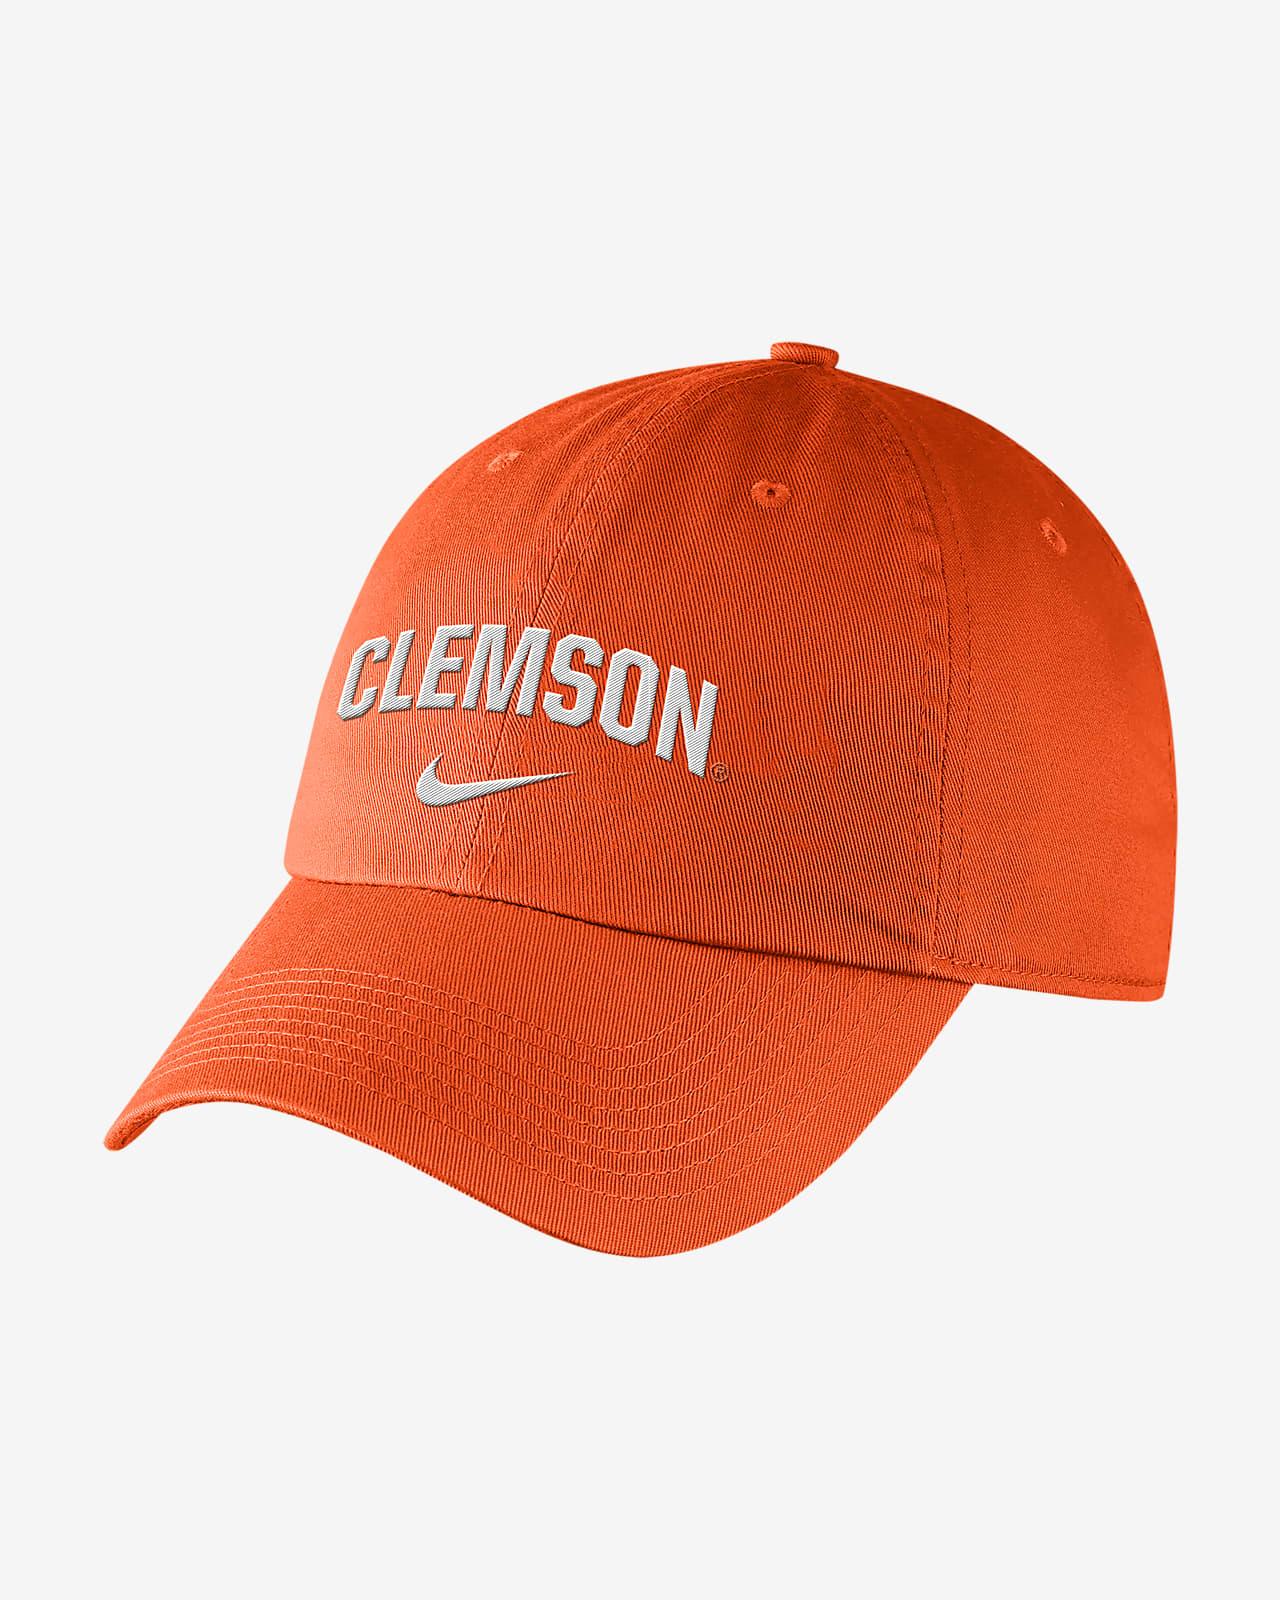 Nike College (Clemson) Hat